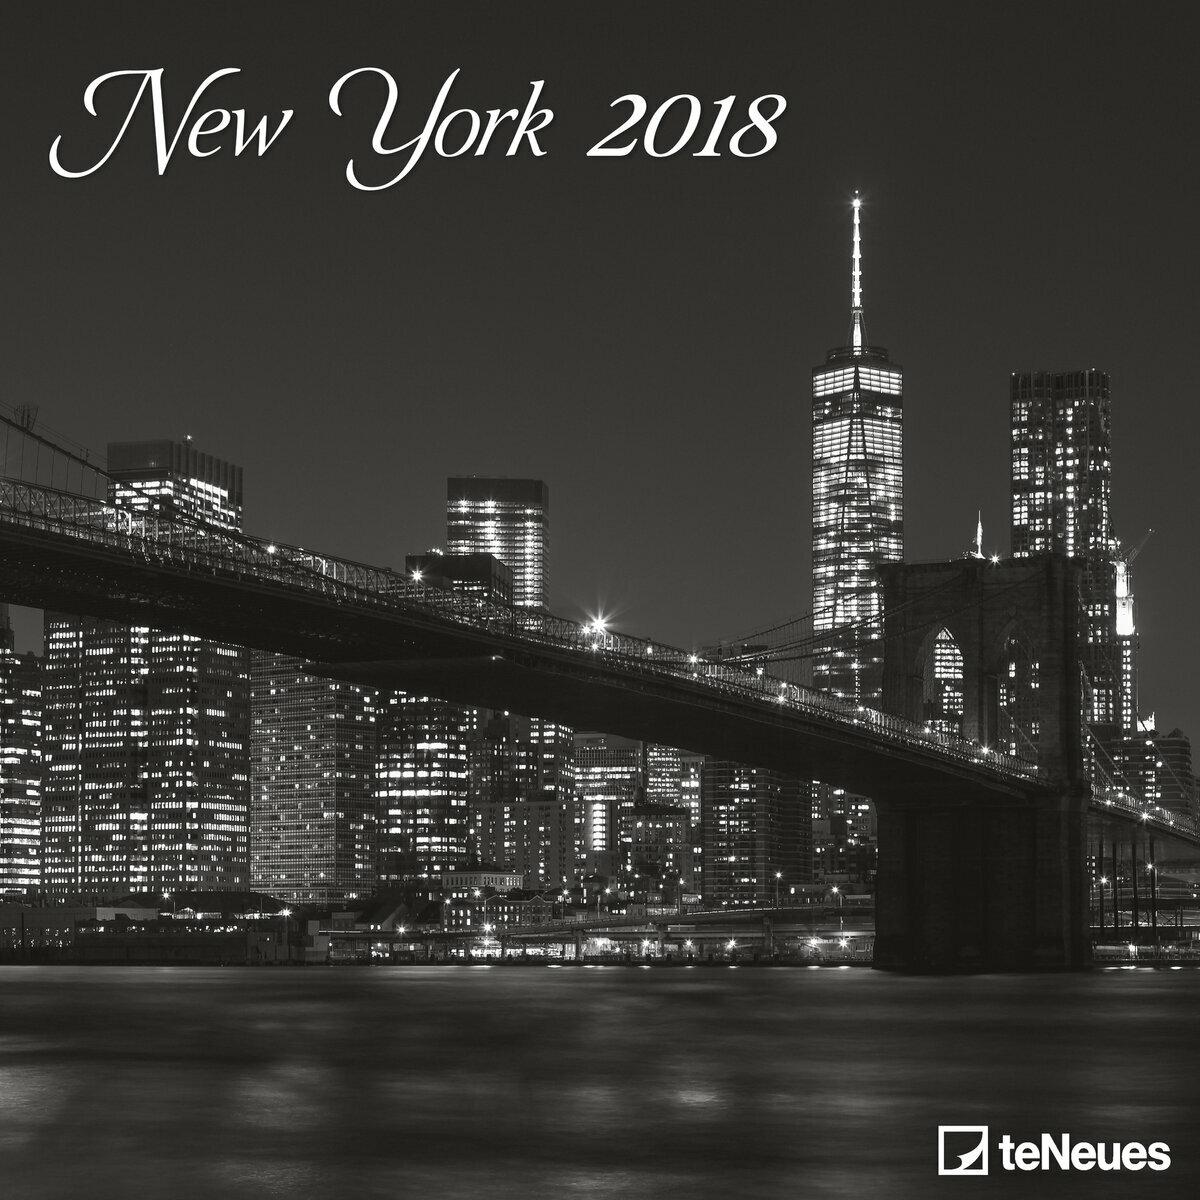 Calendrier new york 2018 for Credence new york noir et blanc